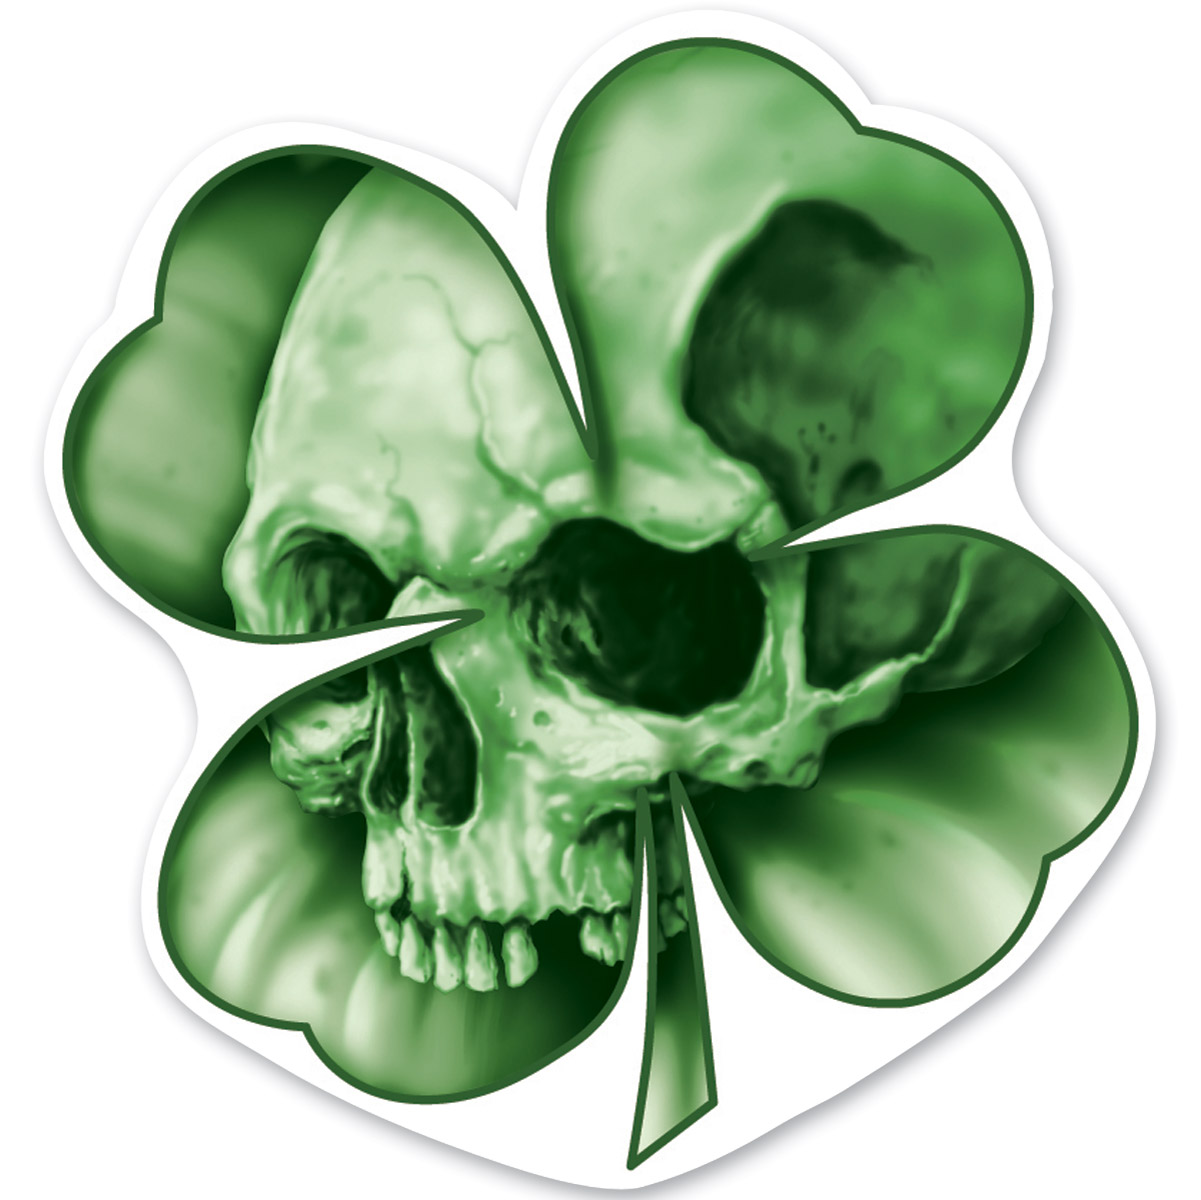 Lethal Threat Rude & Crude Leaf Clover Skull Mini Decal